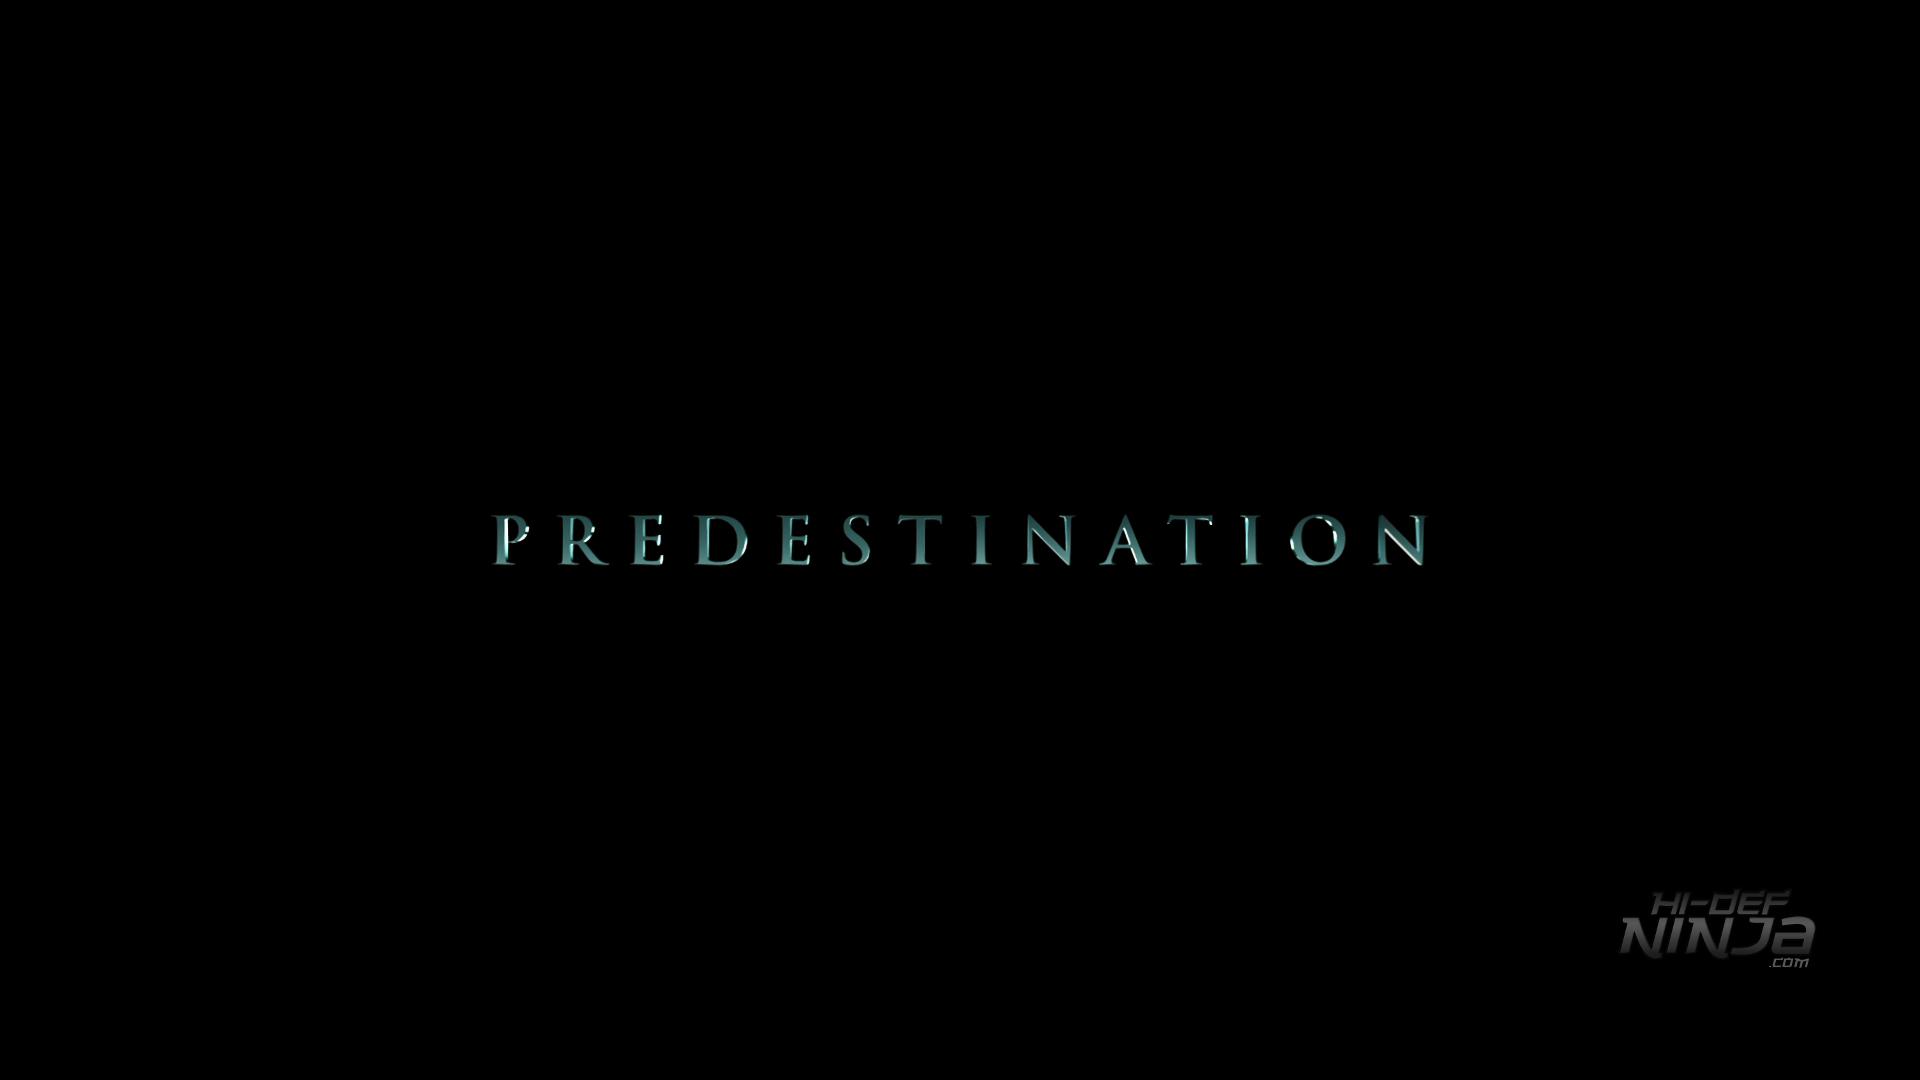 Predestination_HiDefNinja (1)